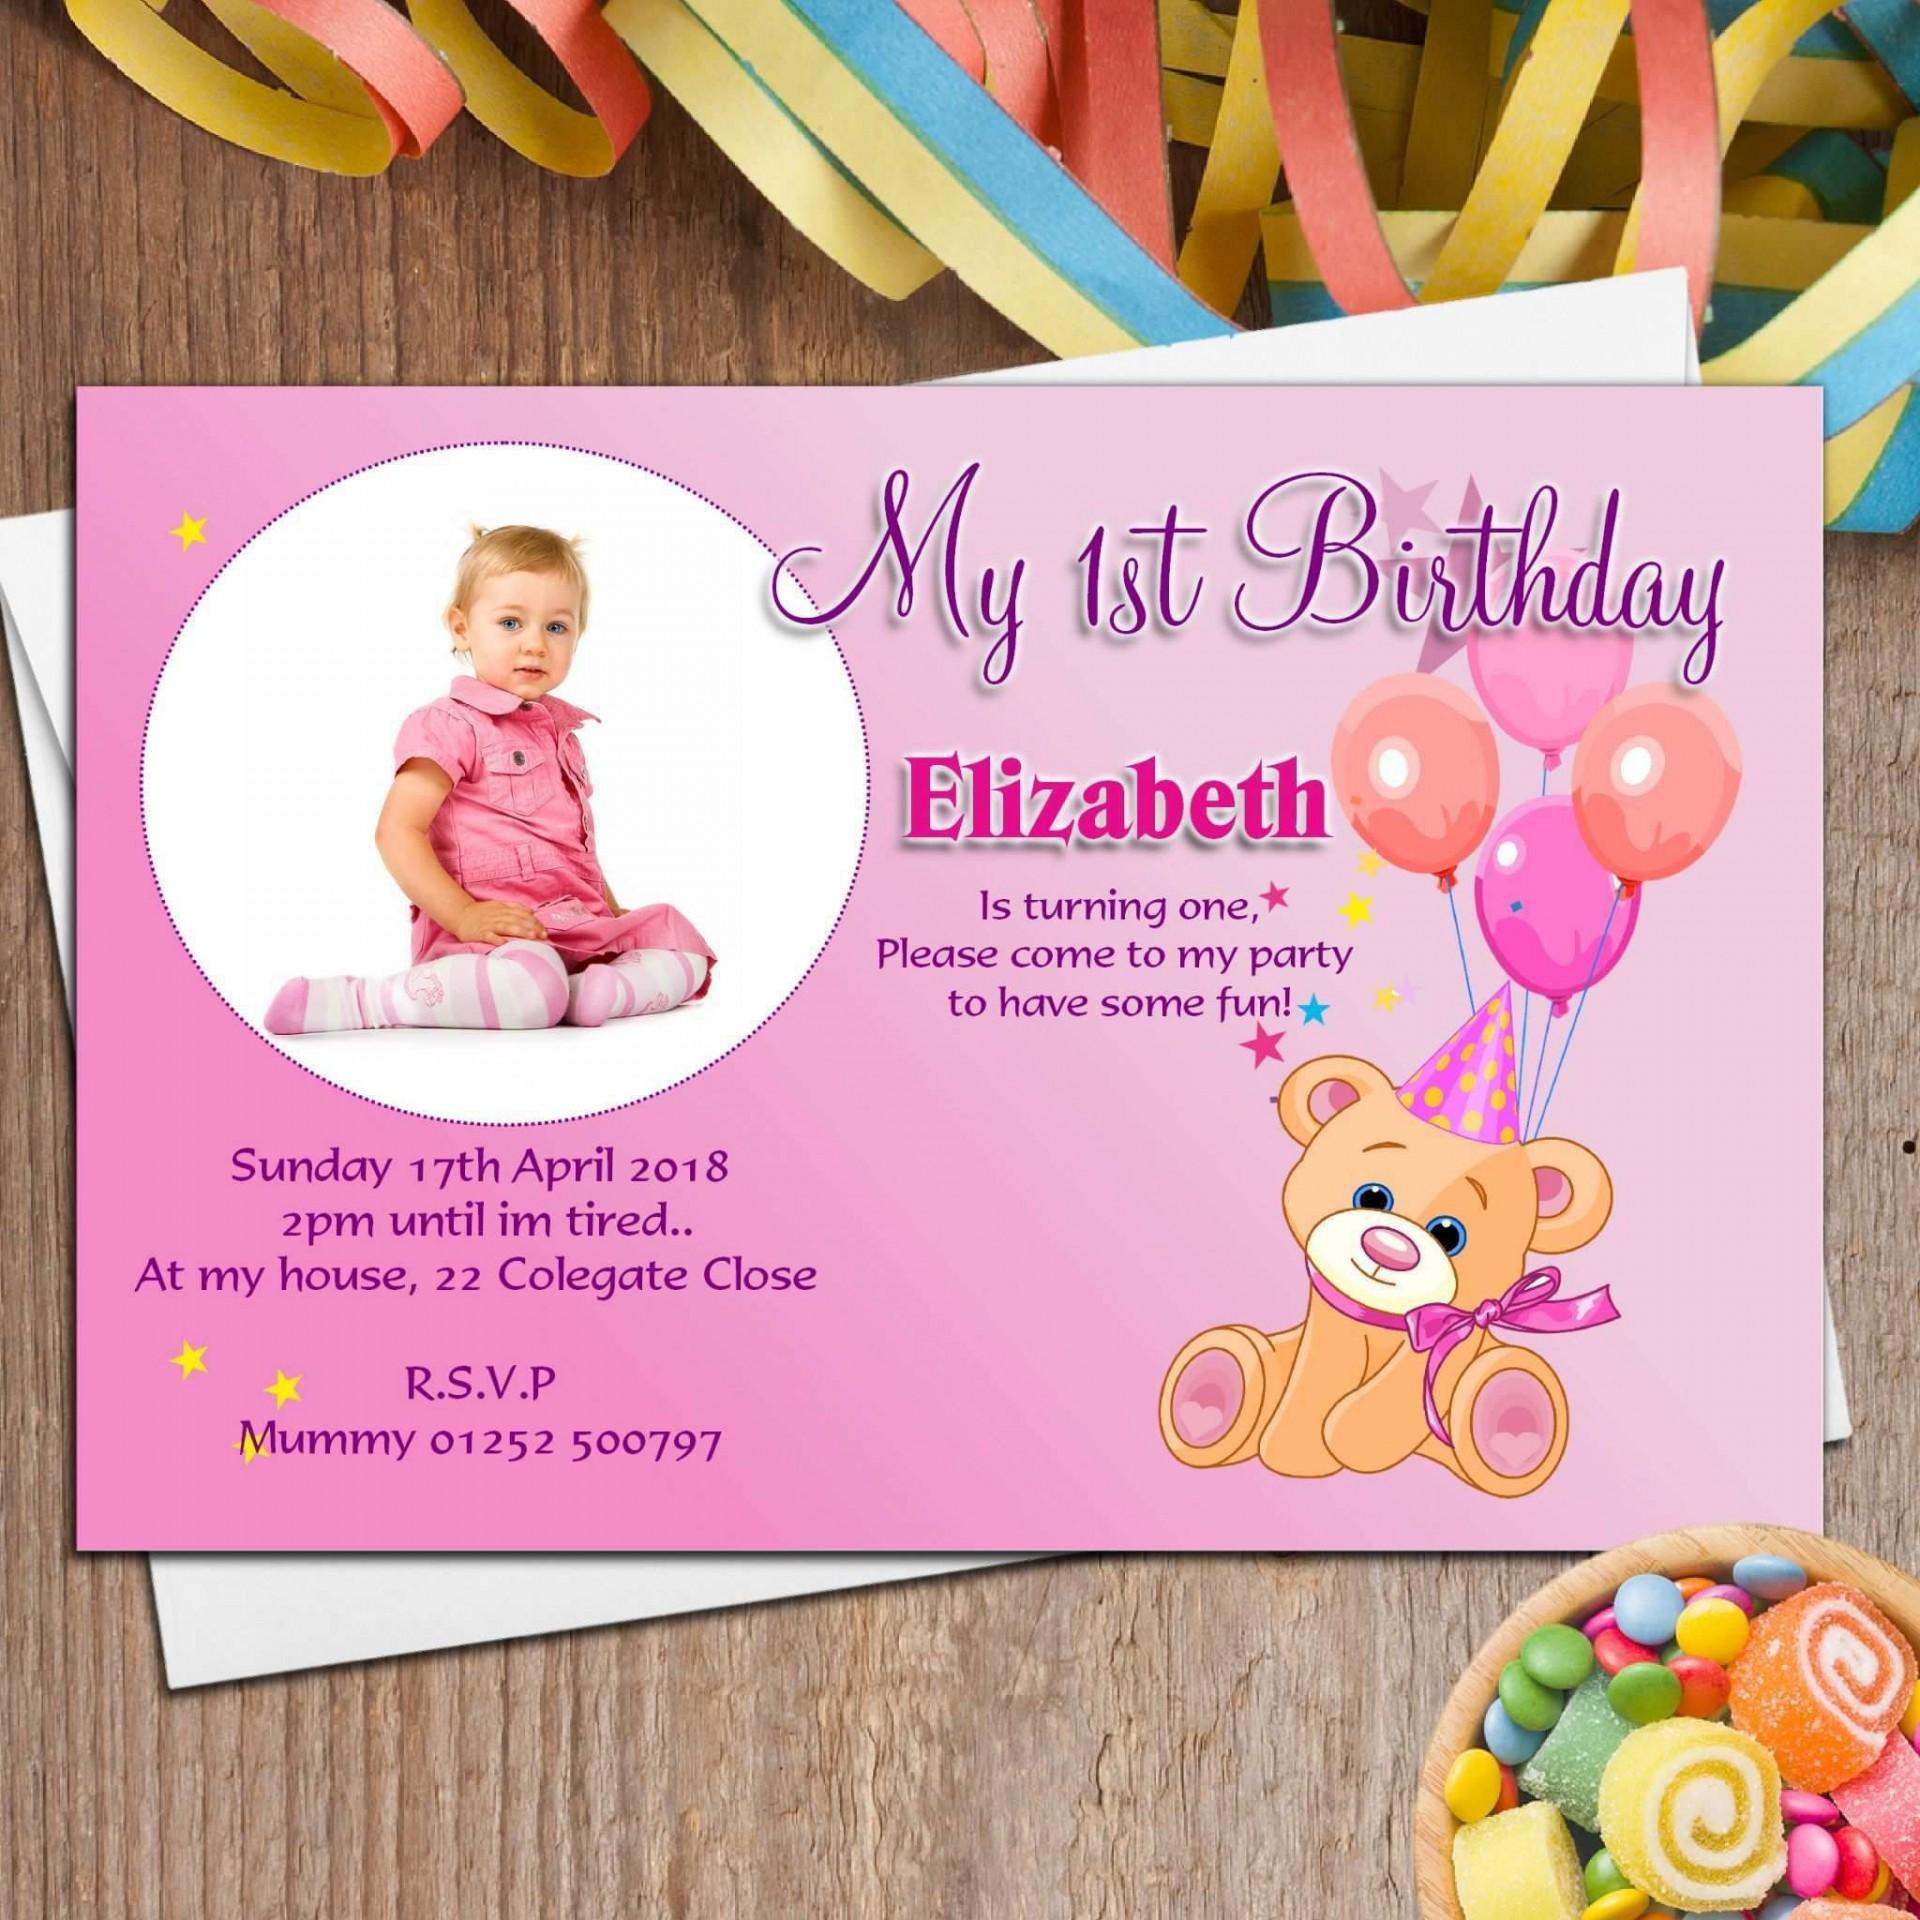 006 Astounding Birthday Invitation Card Word Format Design  Template Free1920